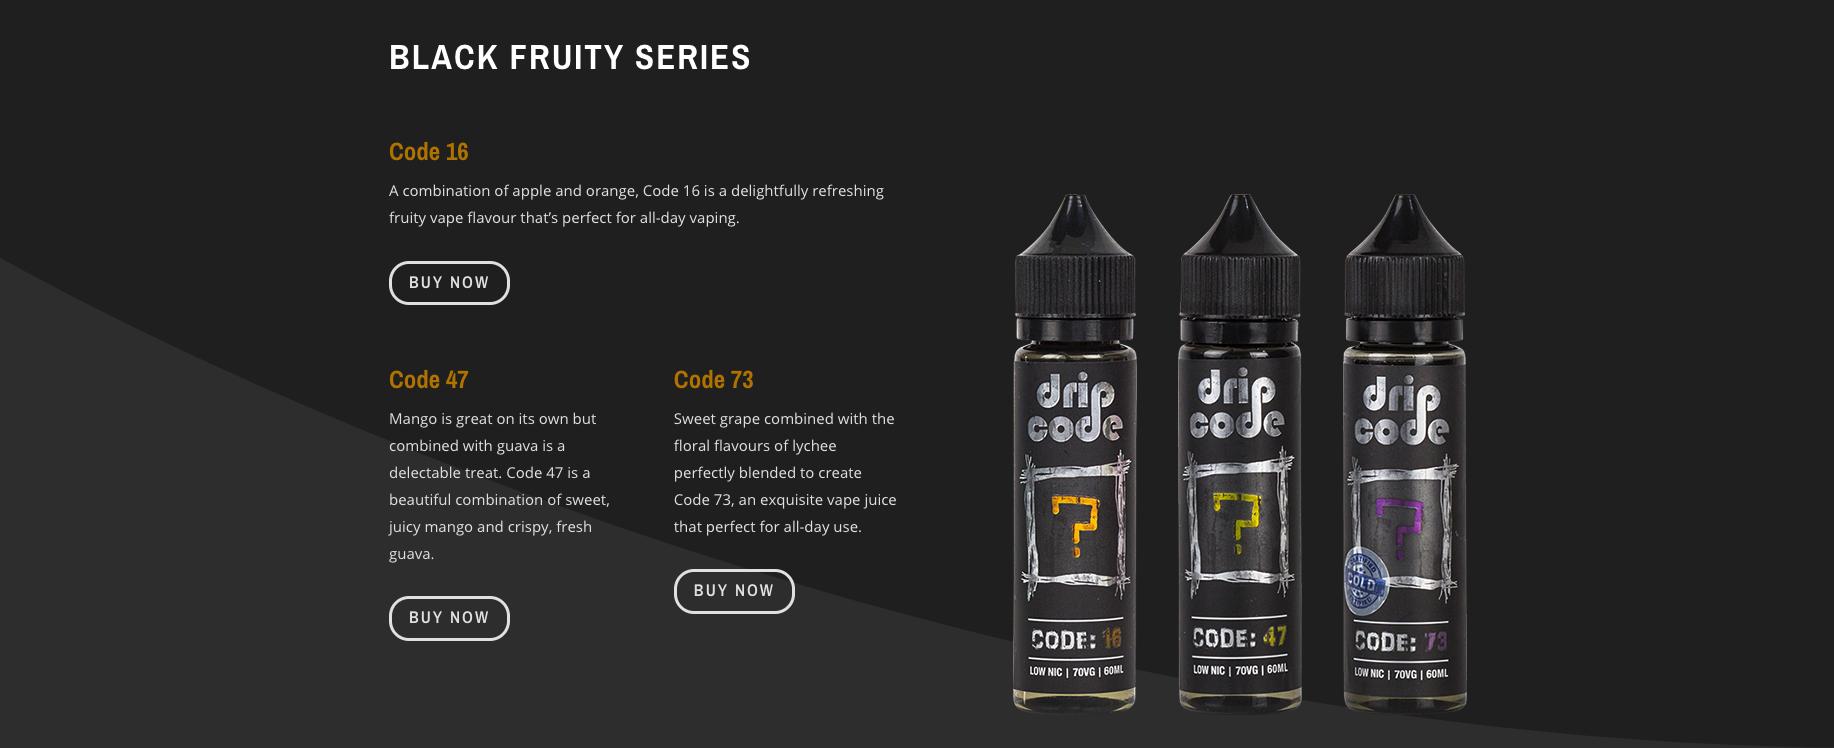 GENUINE Drip Code - Code 16 - 60ml E-Liquid E-Juice Flavor Vape E-Cigarette  (Does not contain nicotine)